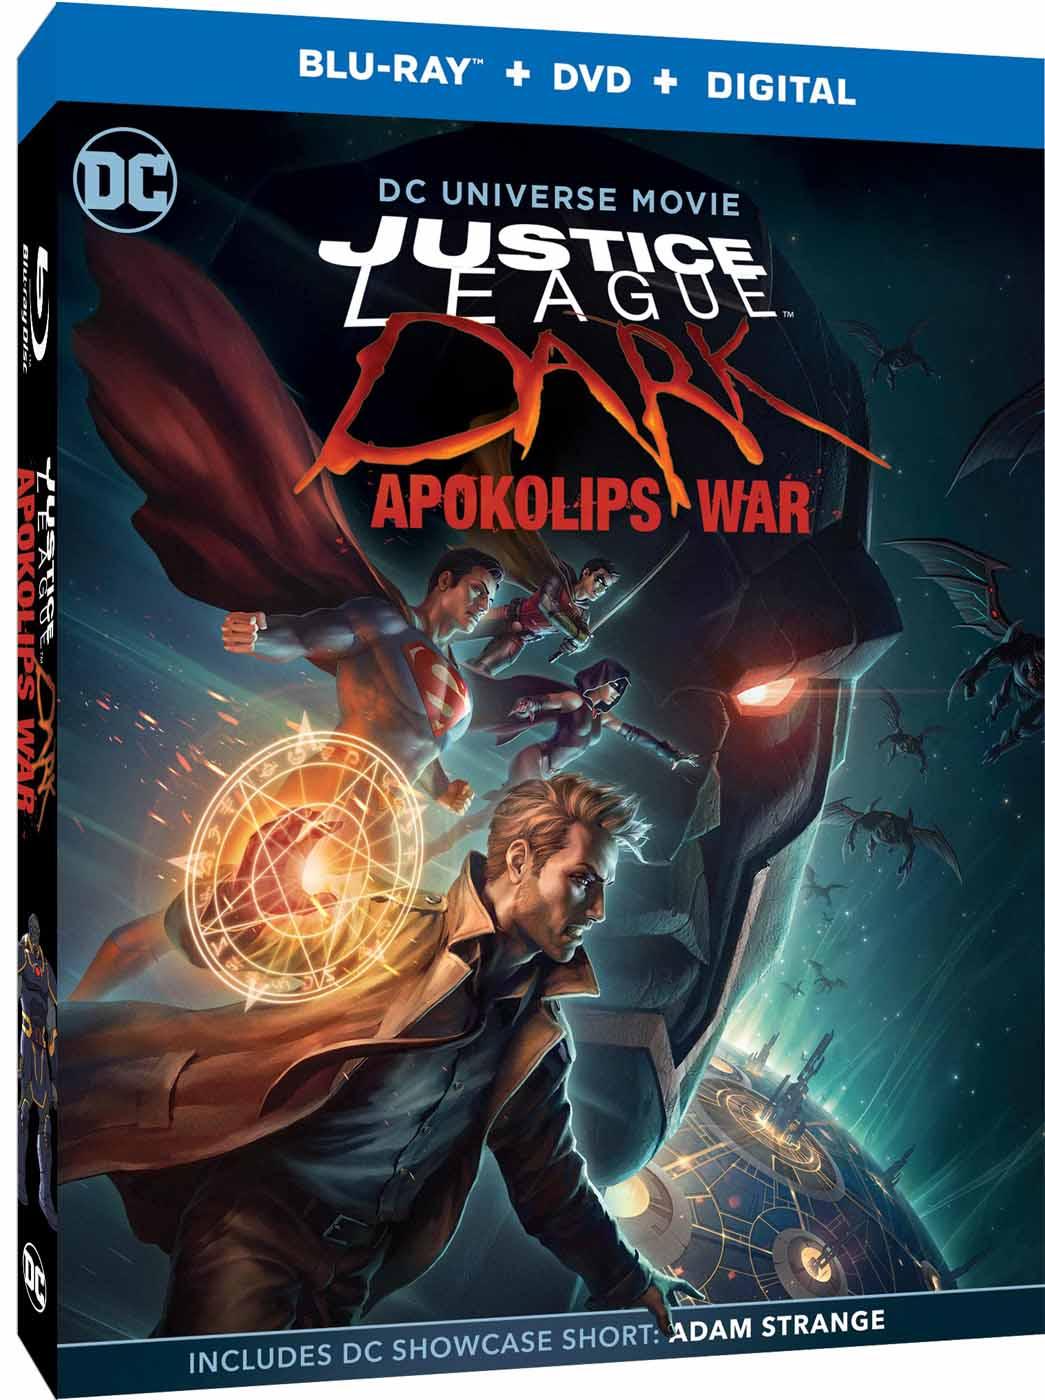 Bande-annonce : Justice League Dark - Apokolips War